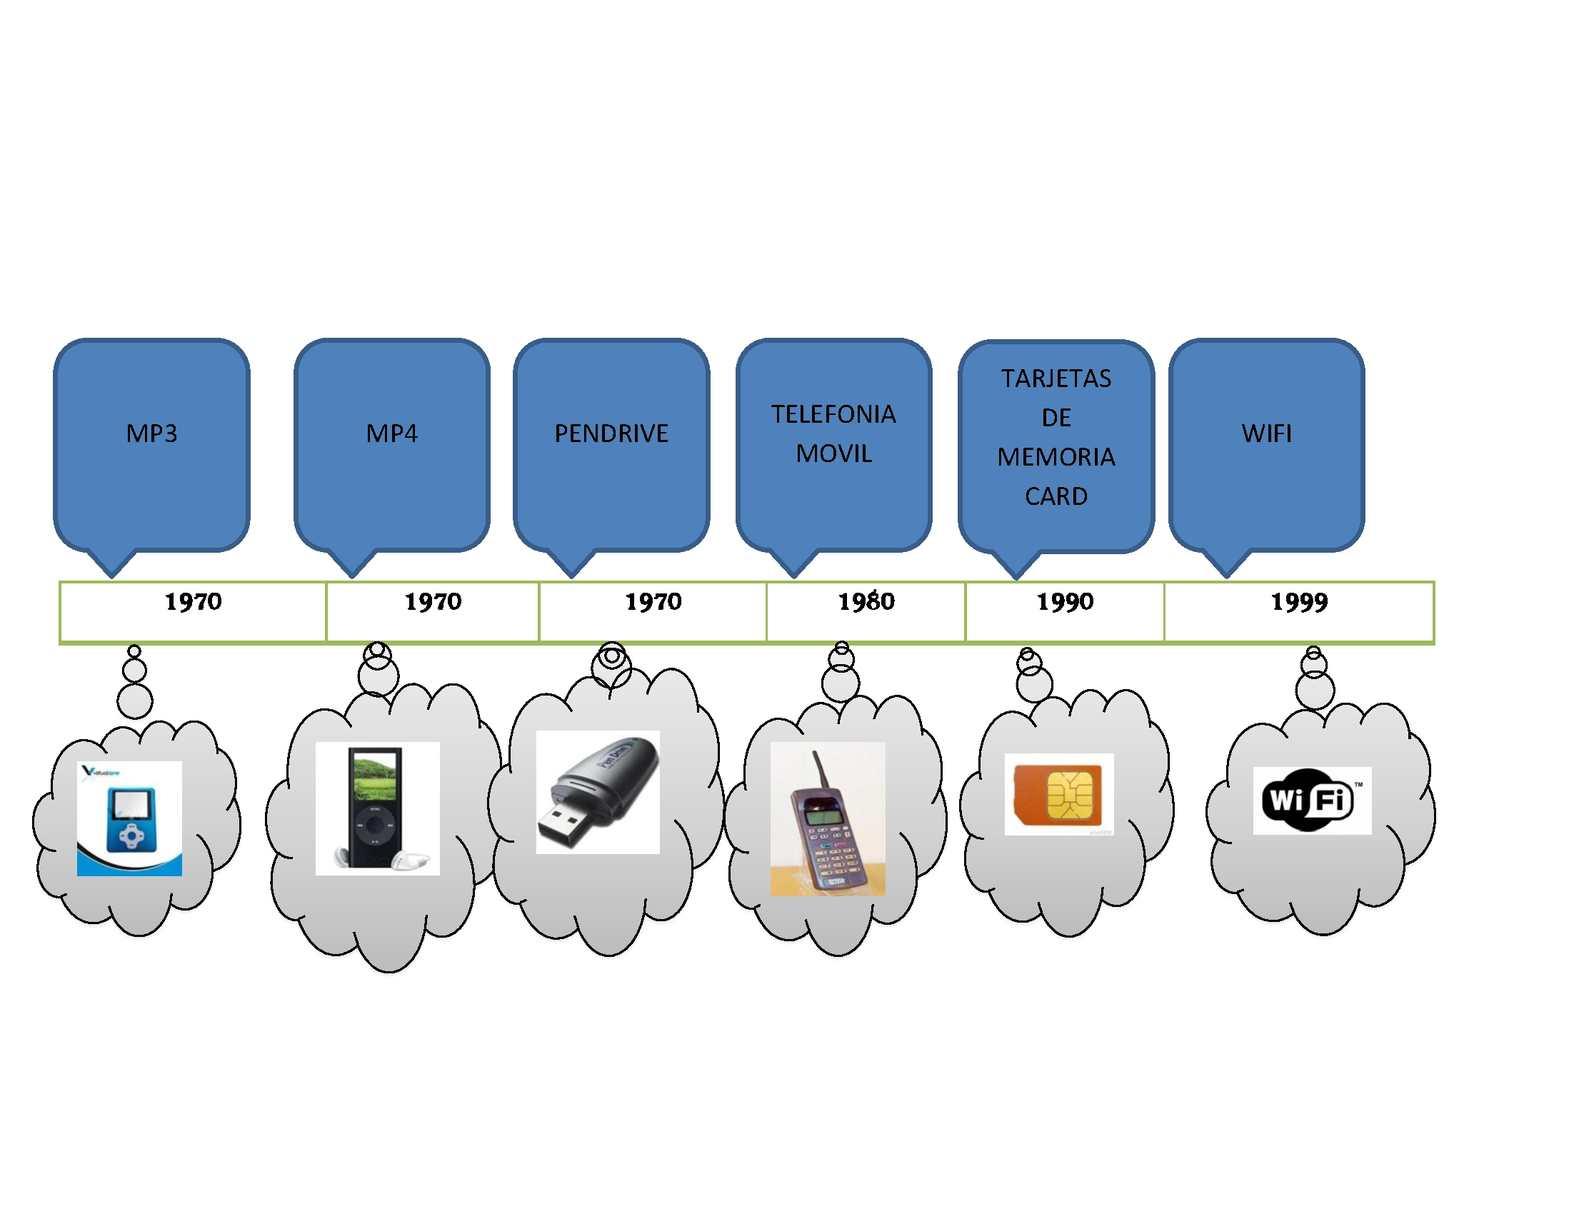 Calam o linea de tiempo sobre inventos del siglo xxi for Linea duero oficina virtual